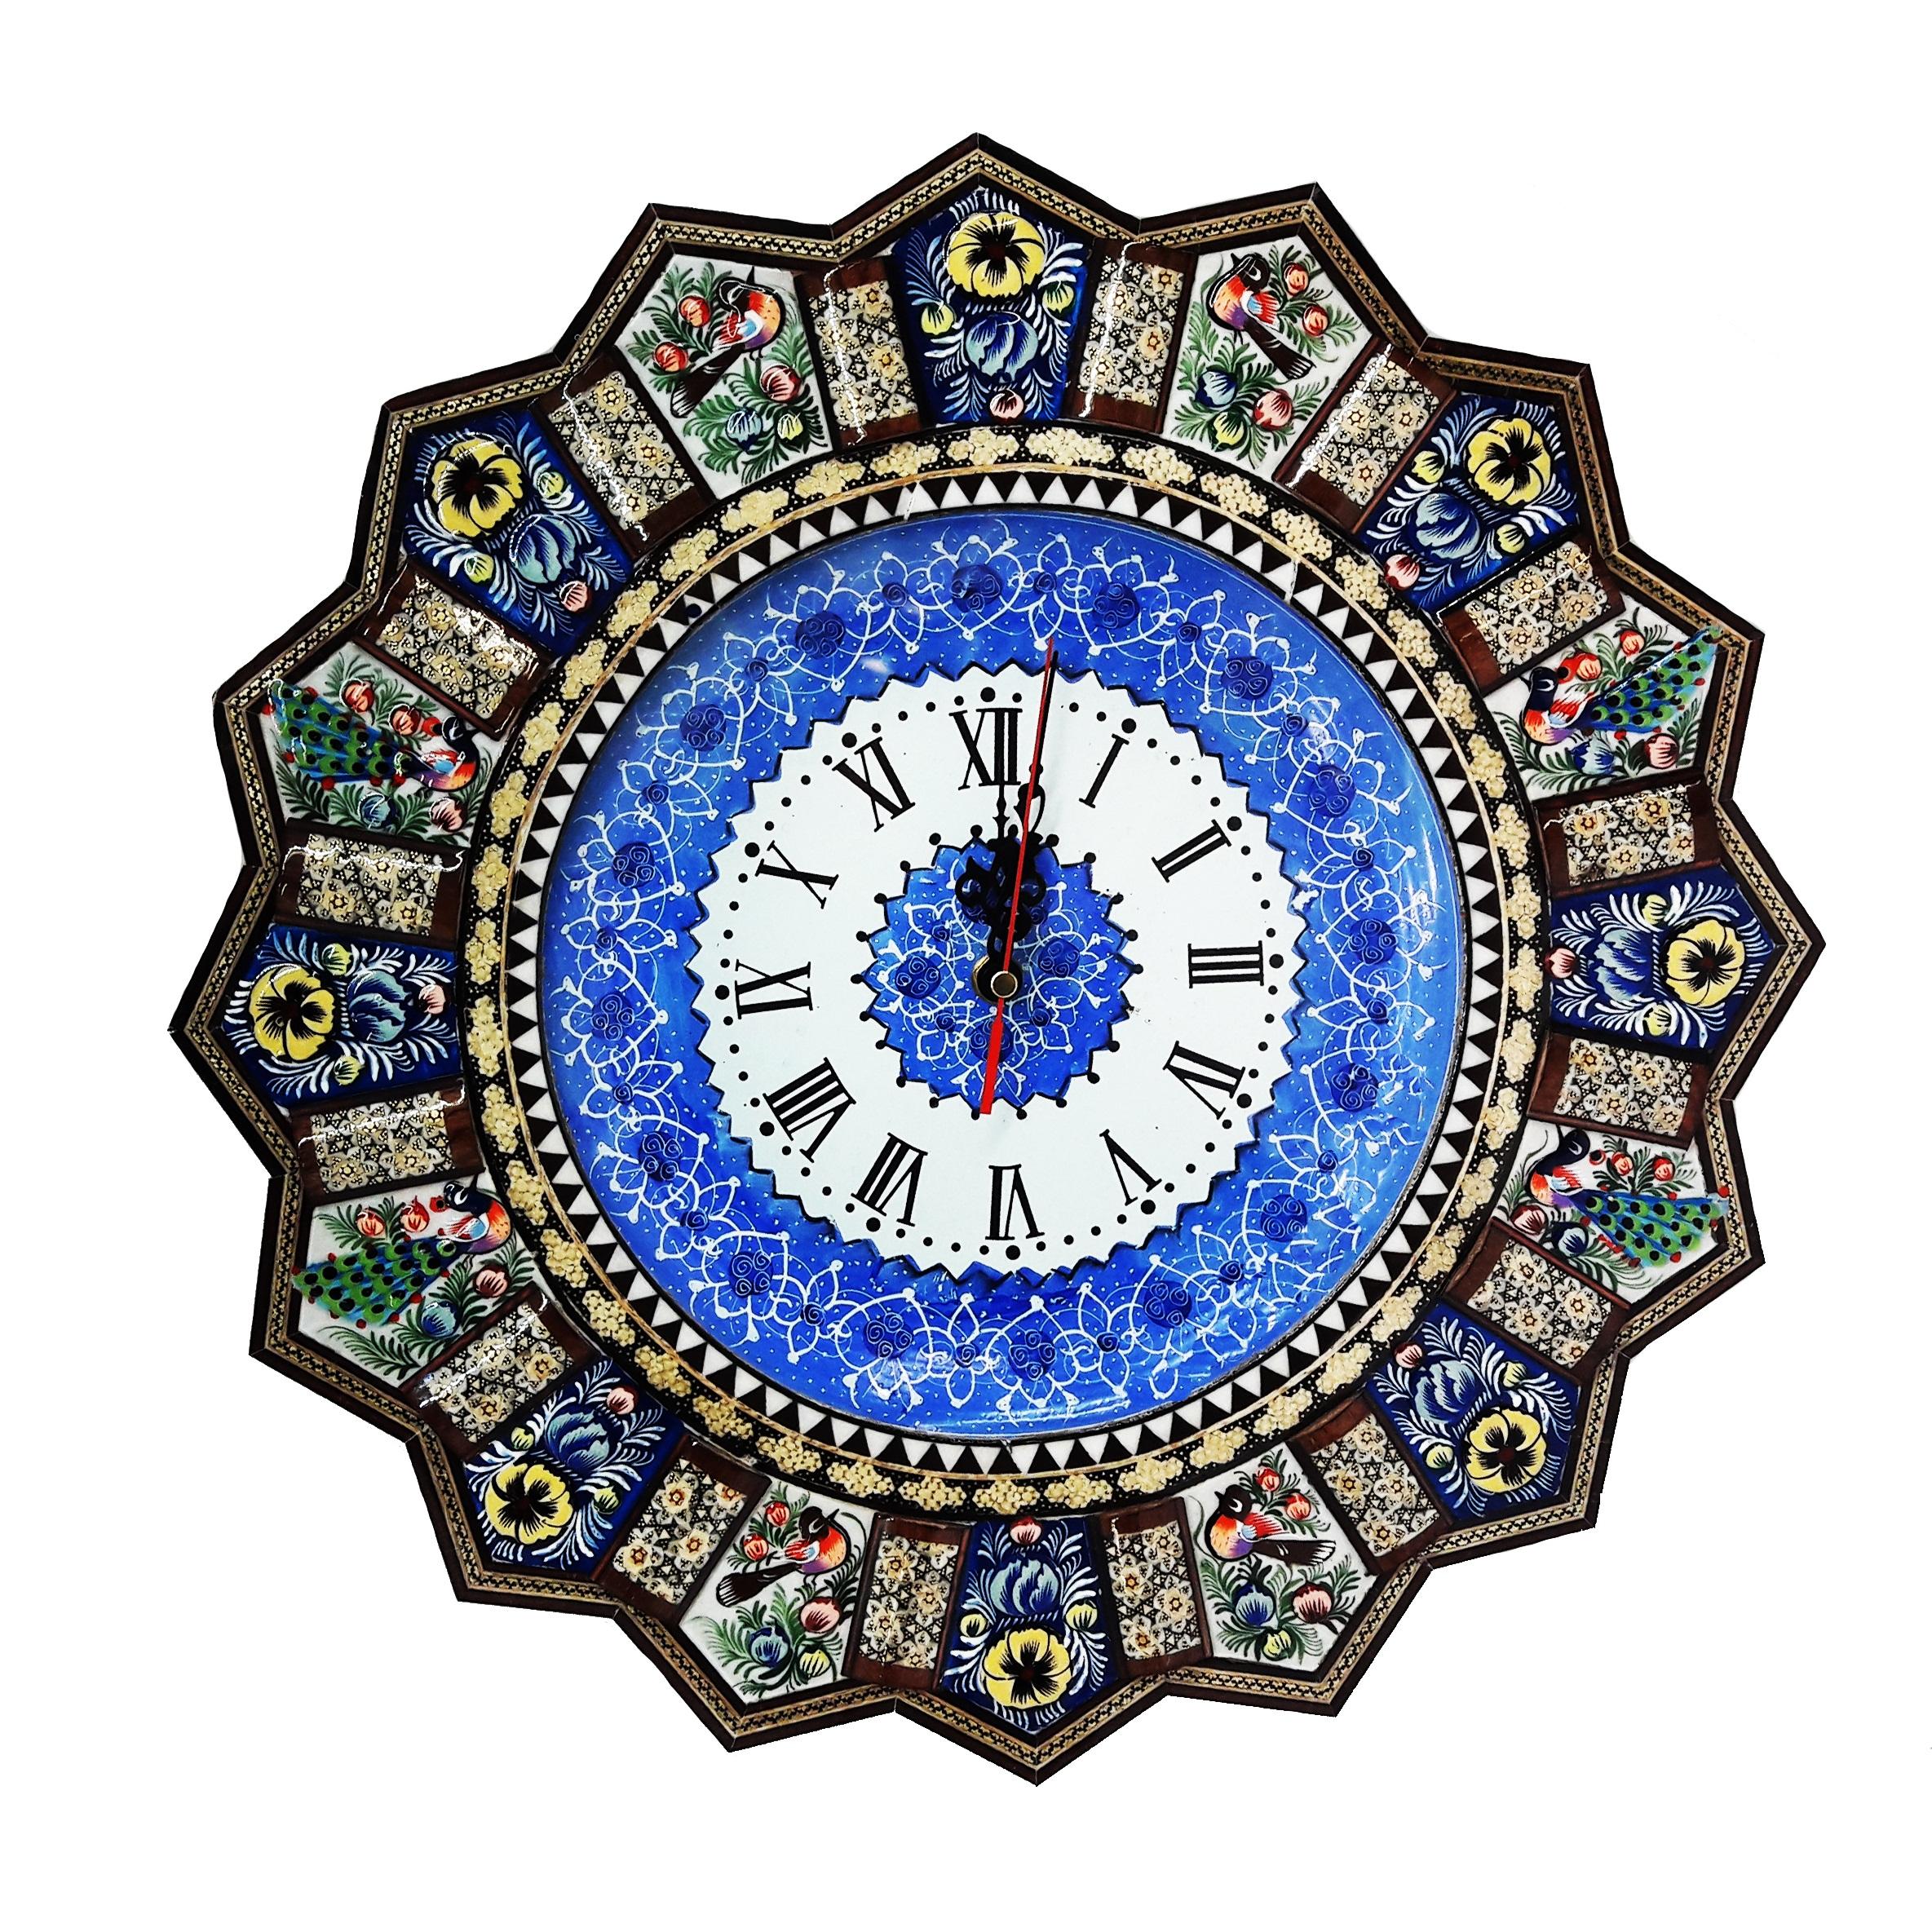 ساعت خاتم کاری طرح خورشیدی کد 225